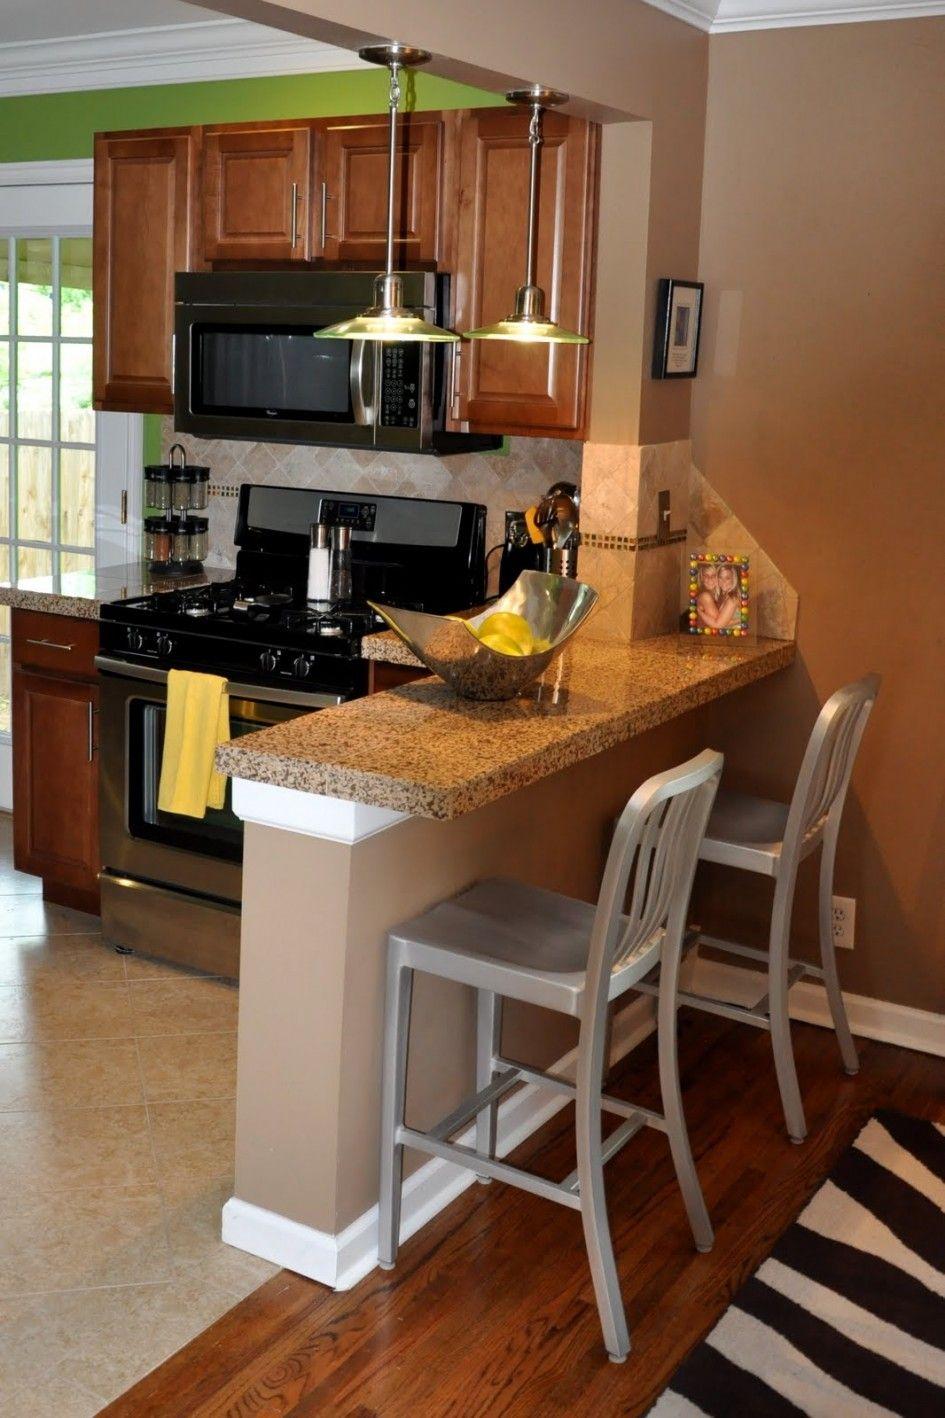 Small Breakfast Bar Idea For Tiny Kitchen Kitchen Design Small